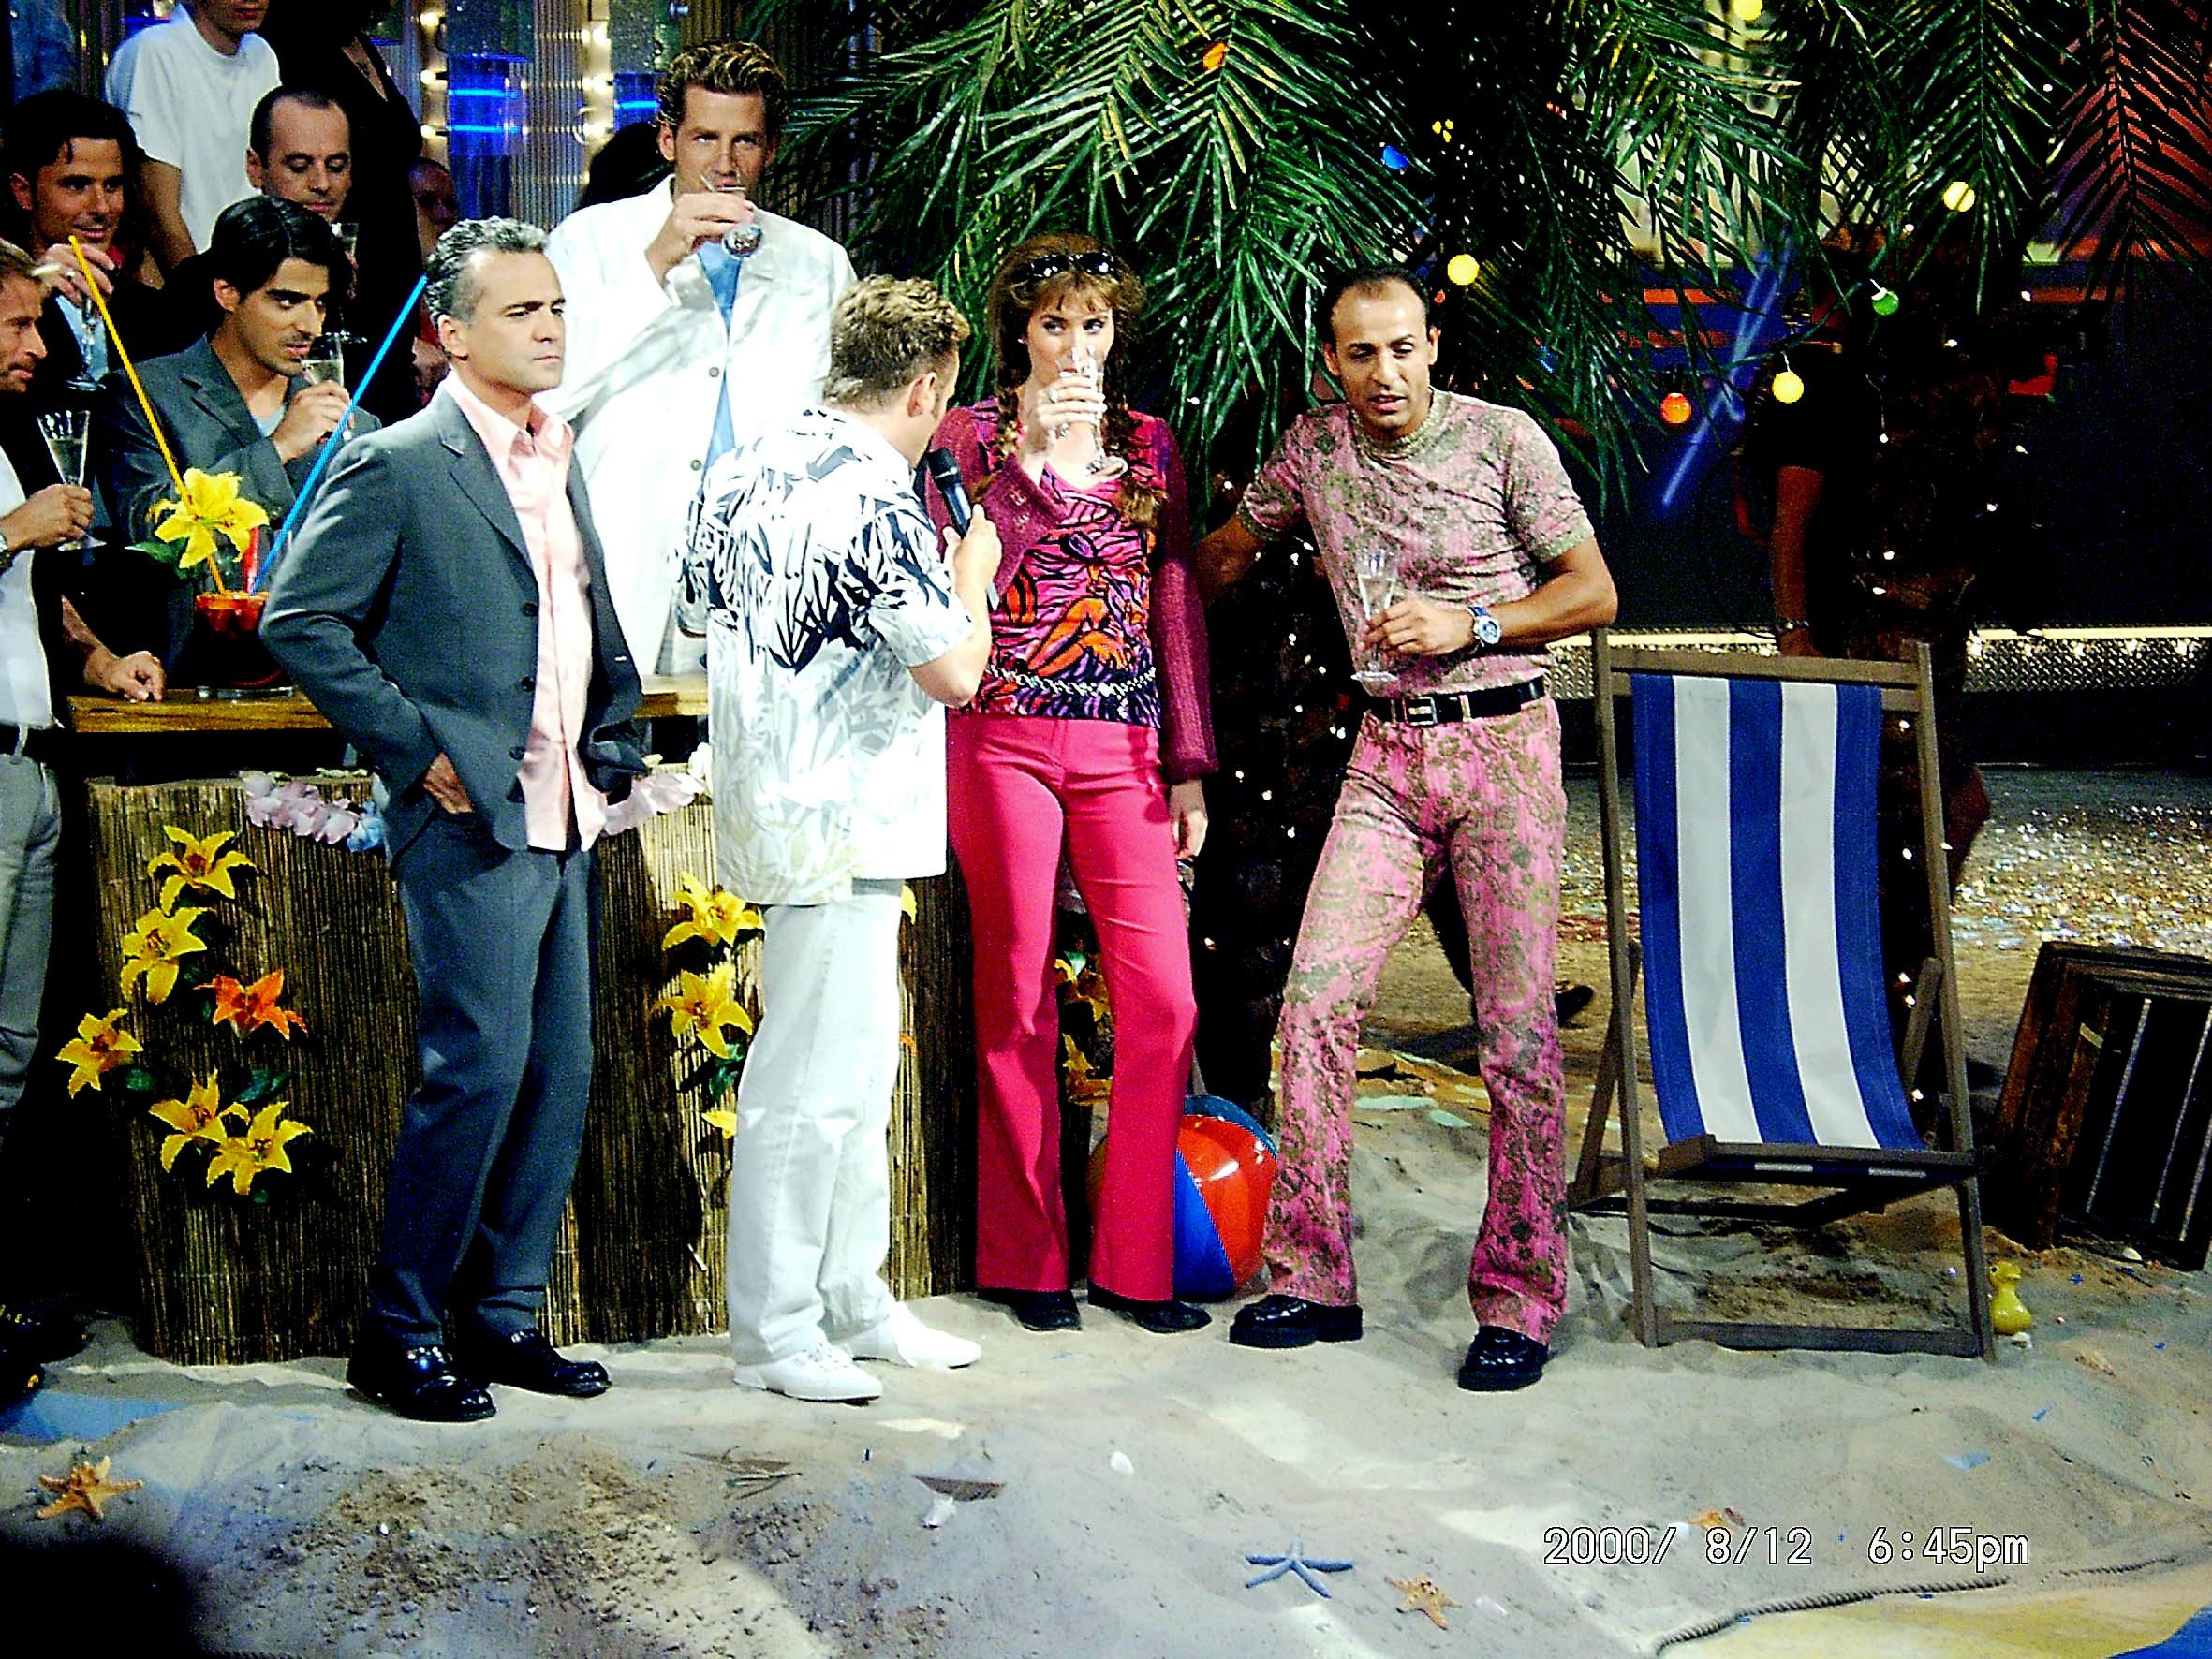 Nino De Angelo, Uwe Hübner, André Stade, Ibrahim Bekirovic, and Claudia Christina in ZDF Hitparade (1969)